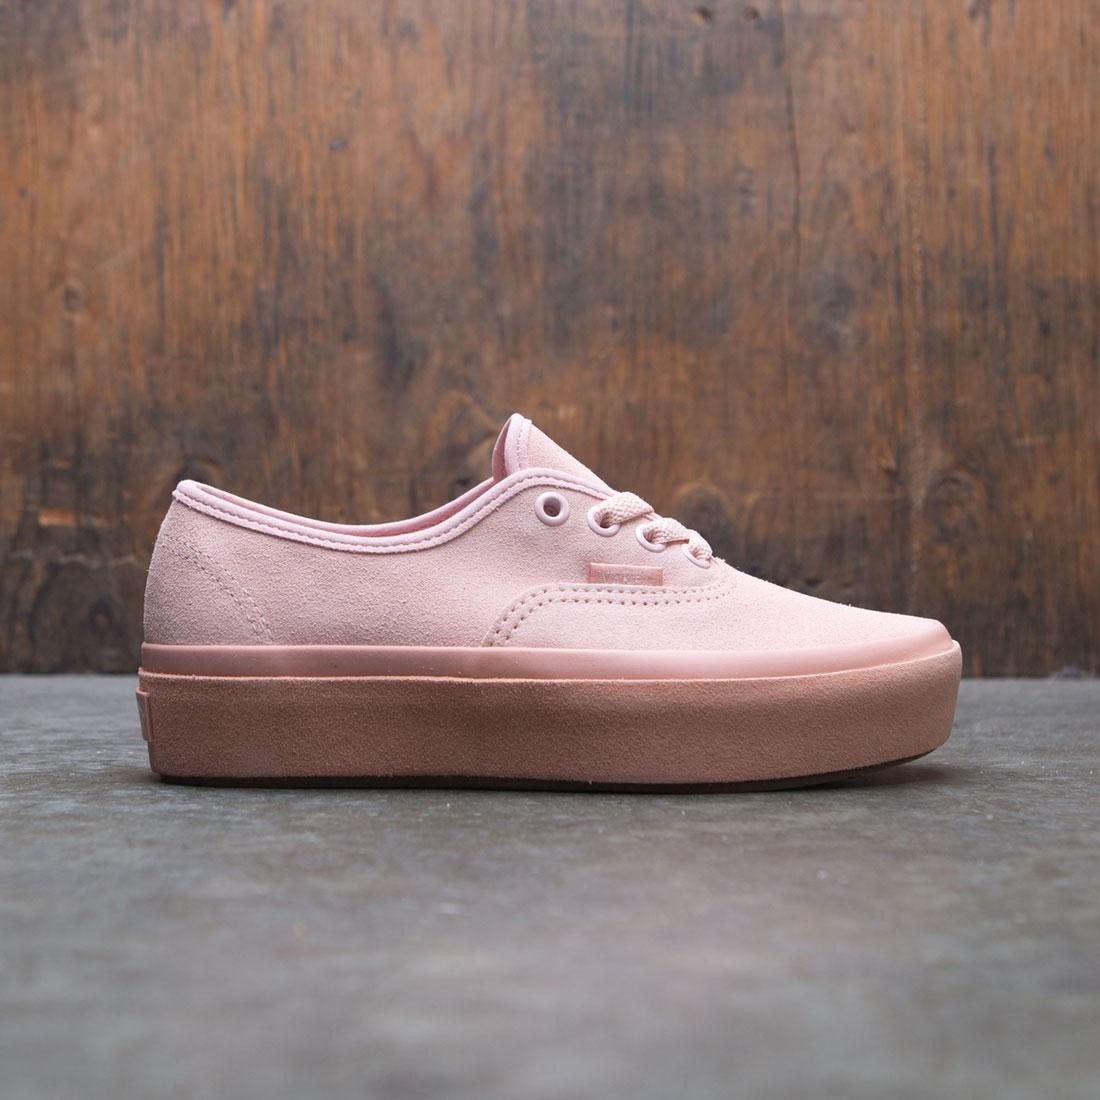 Vans Women Authentic Platform 2.0 pink 7139b540969b